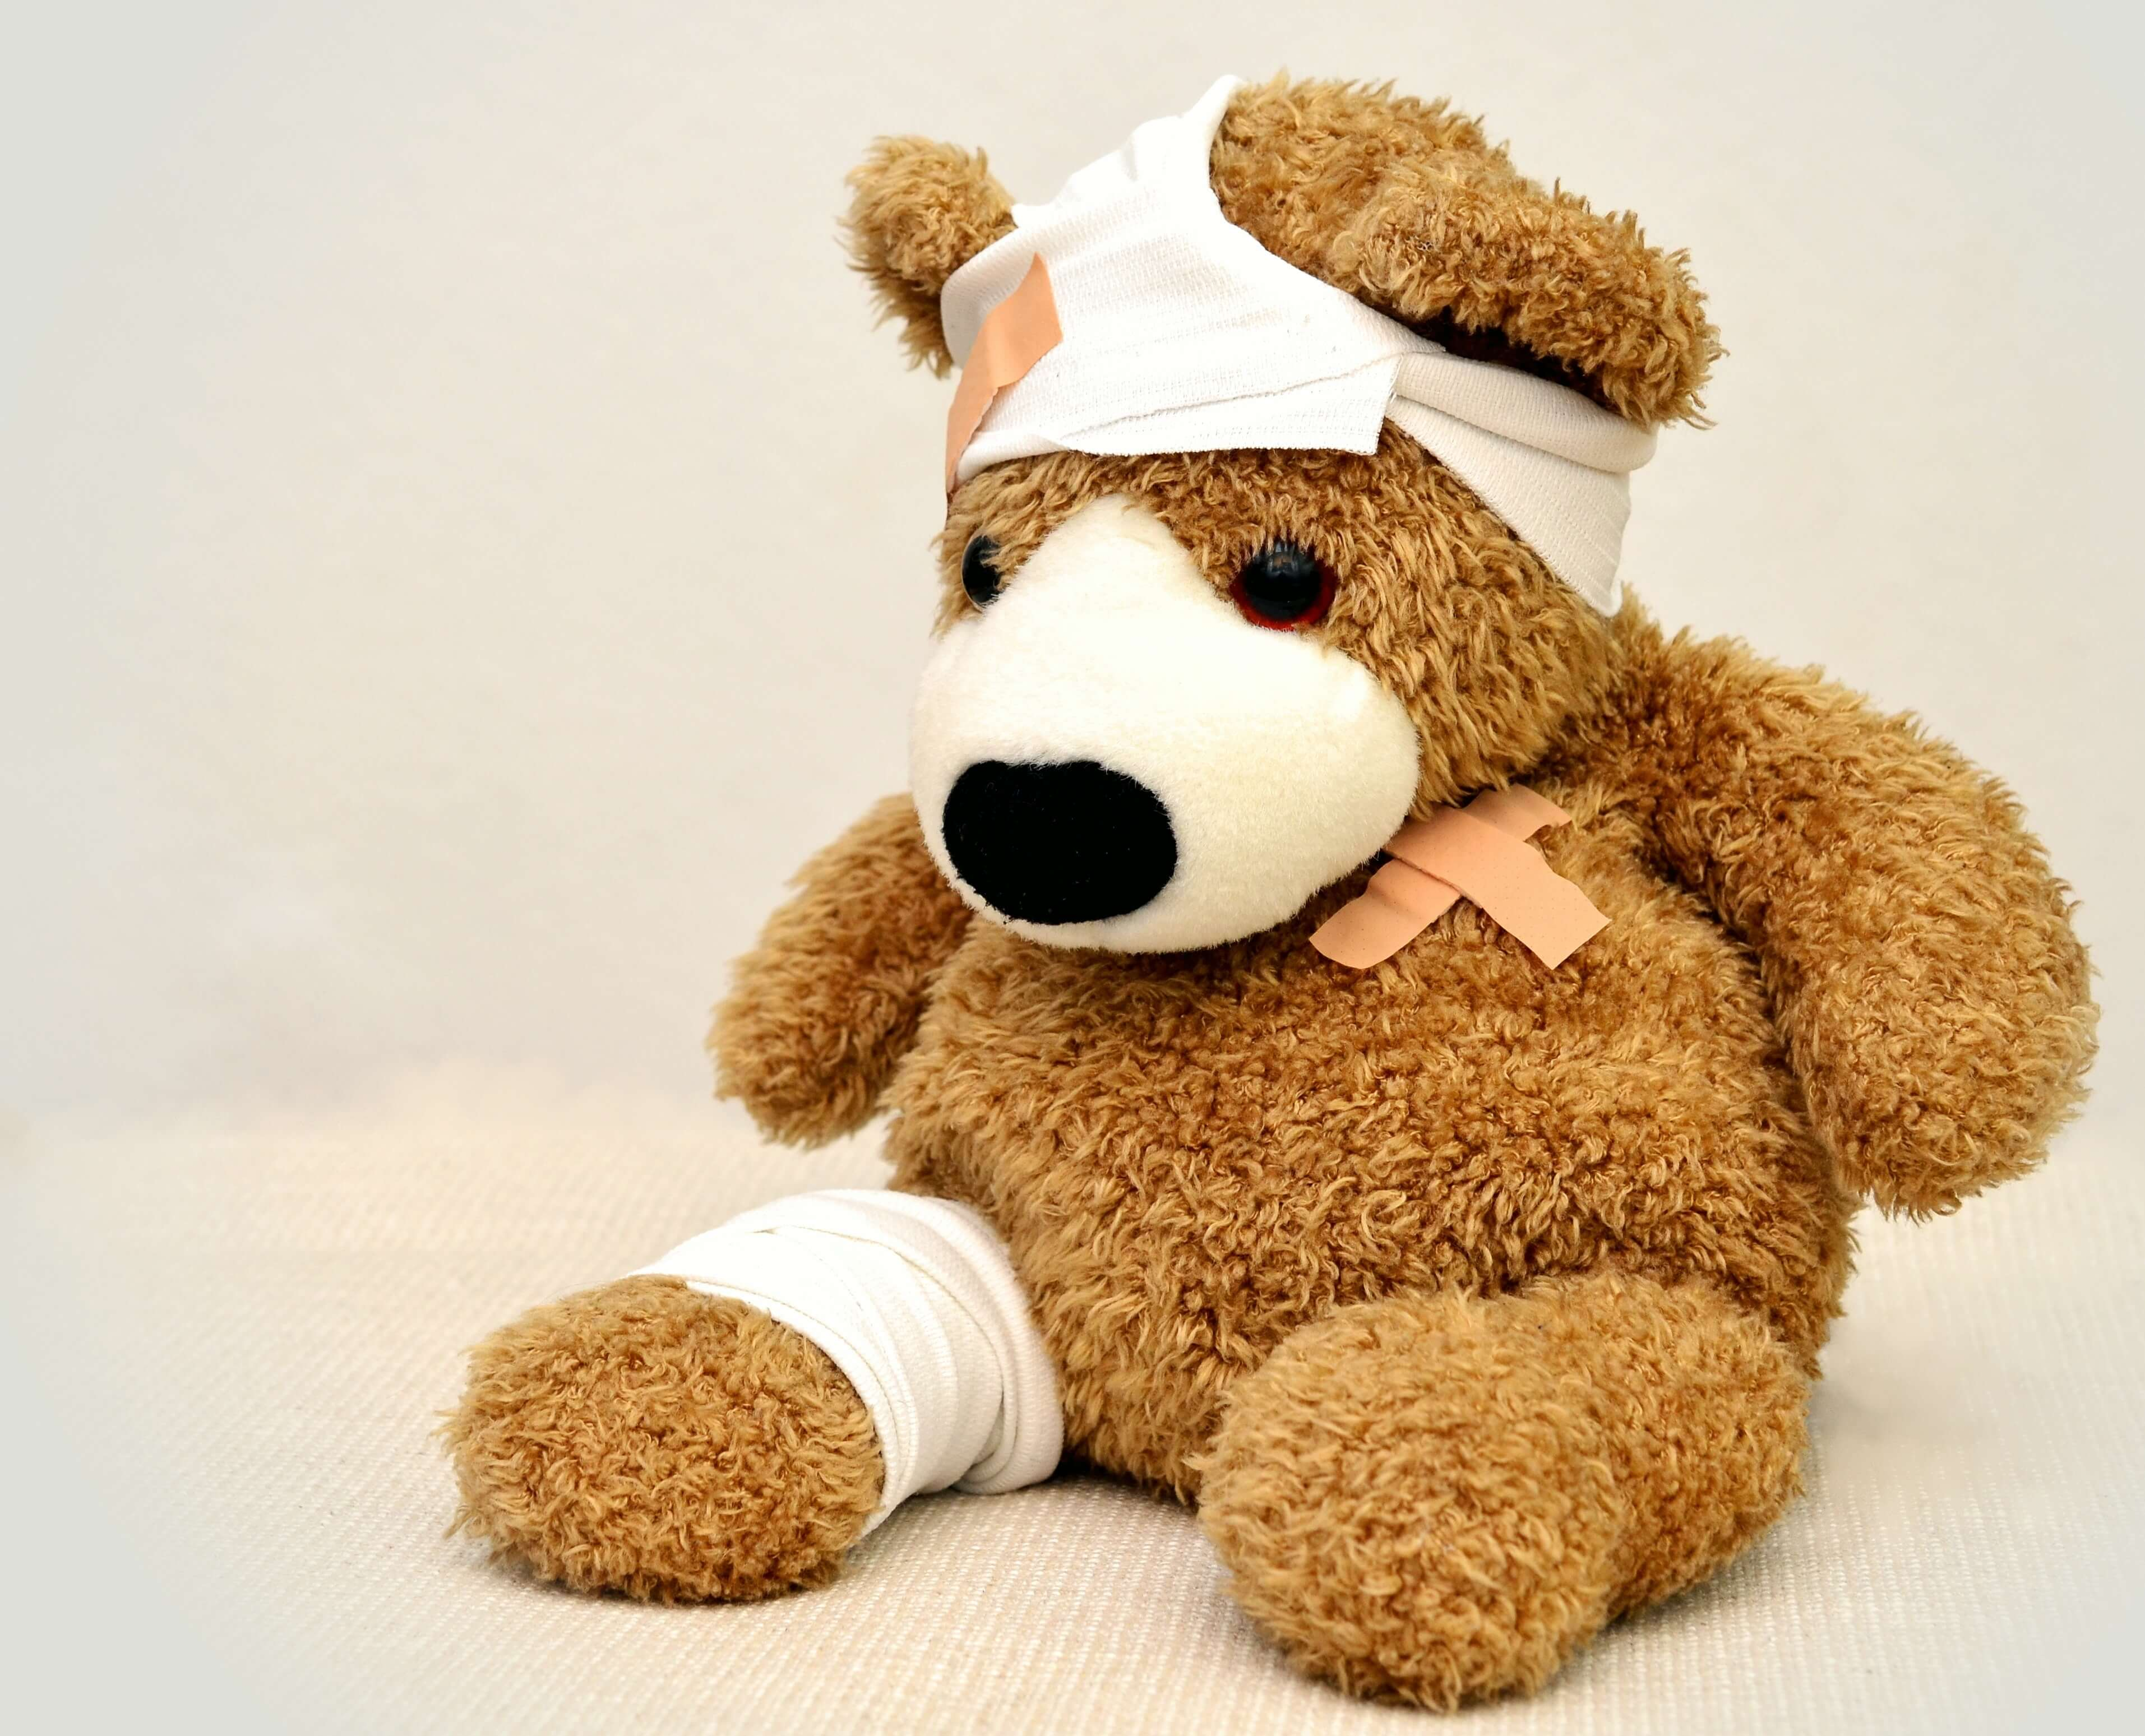 heal-naturally-teddy